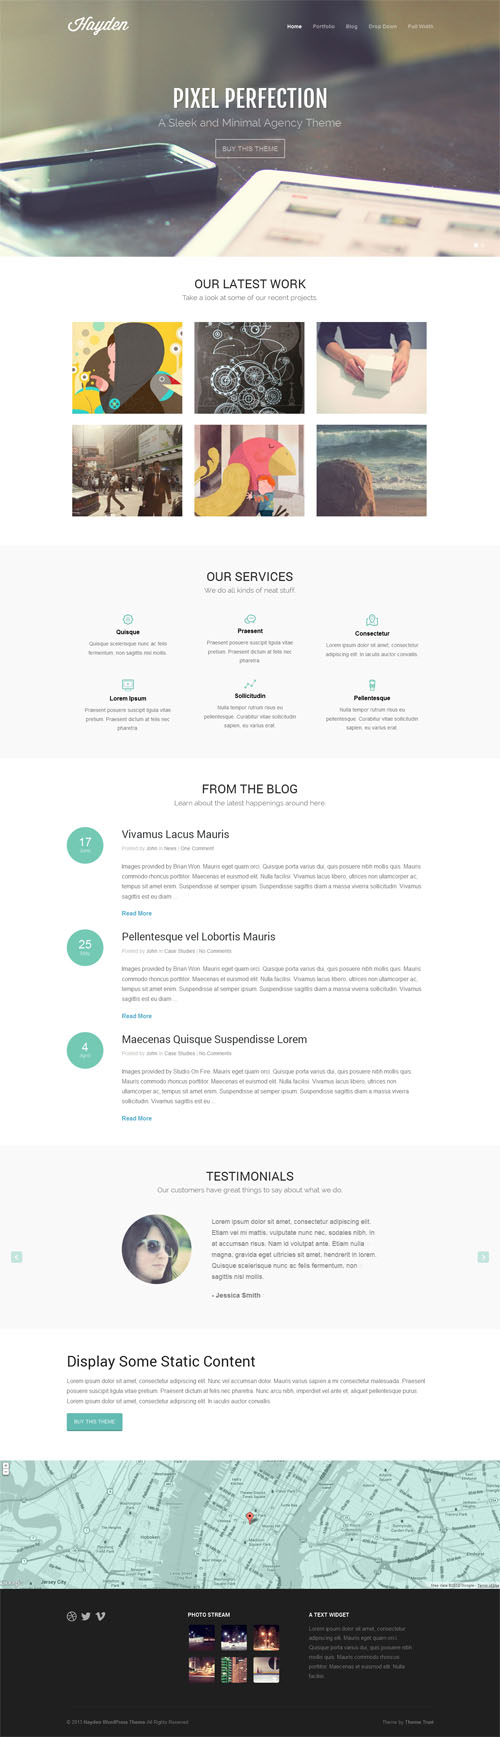 hayden Professional Agency WordPress Theme